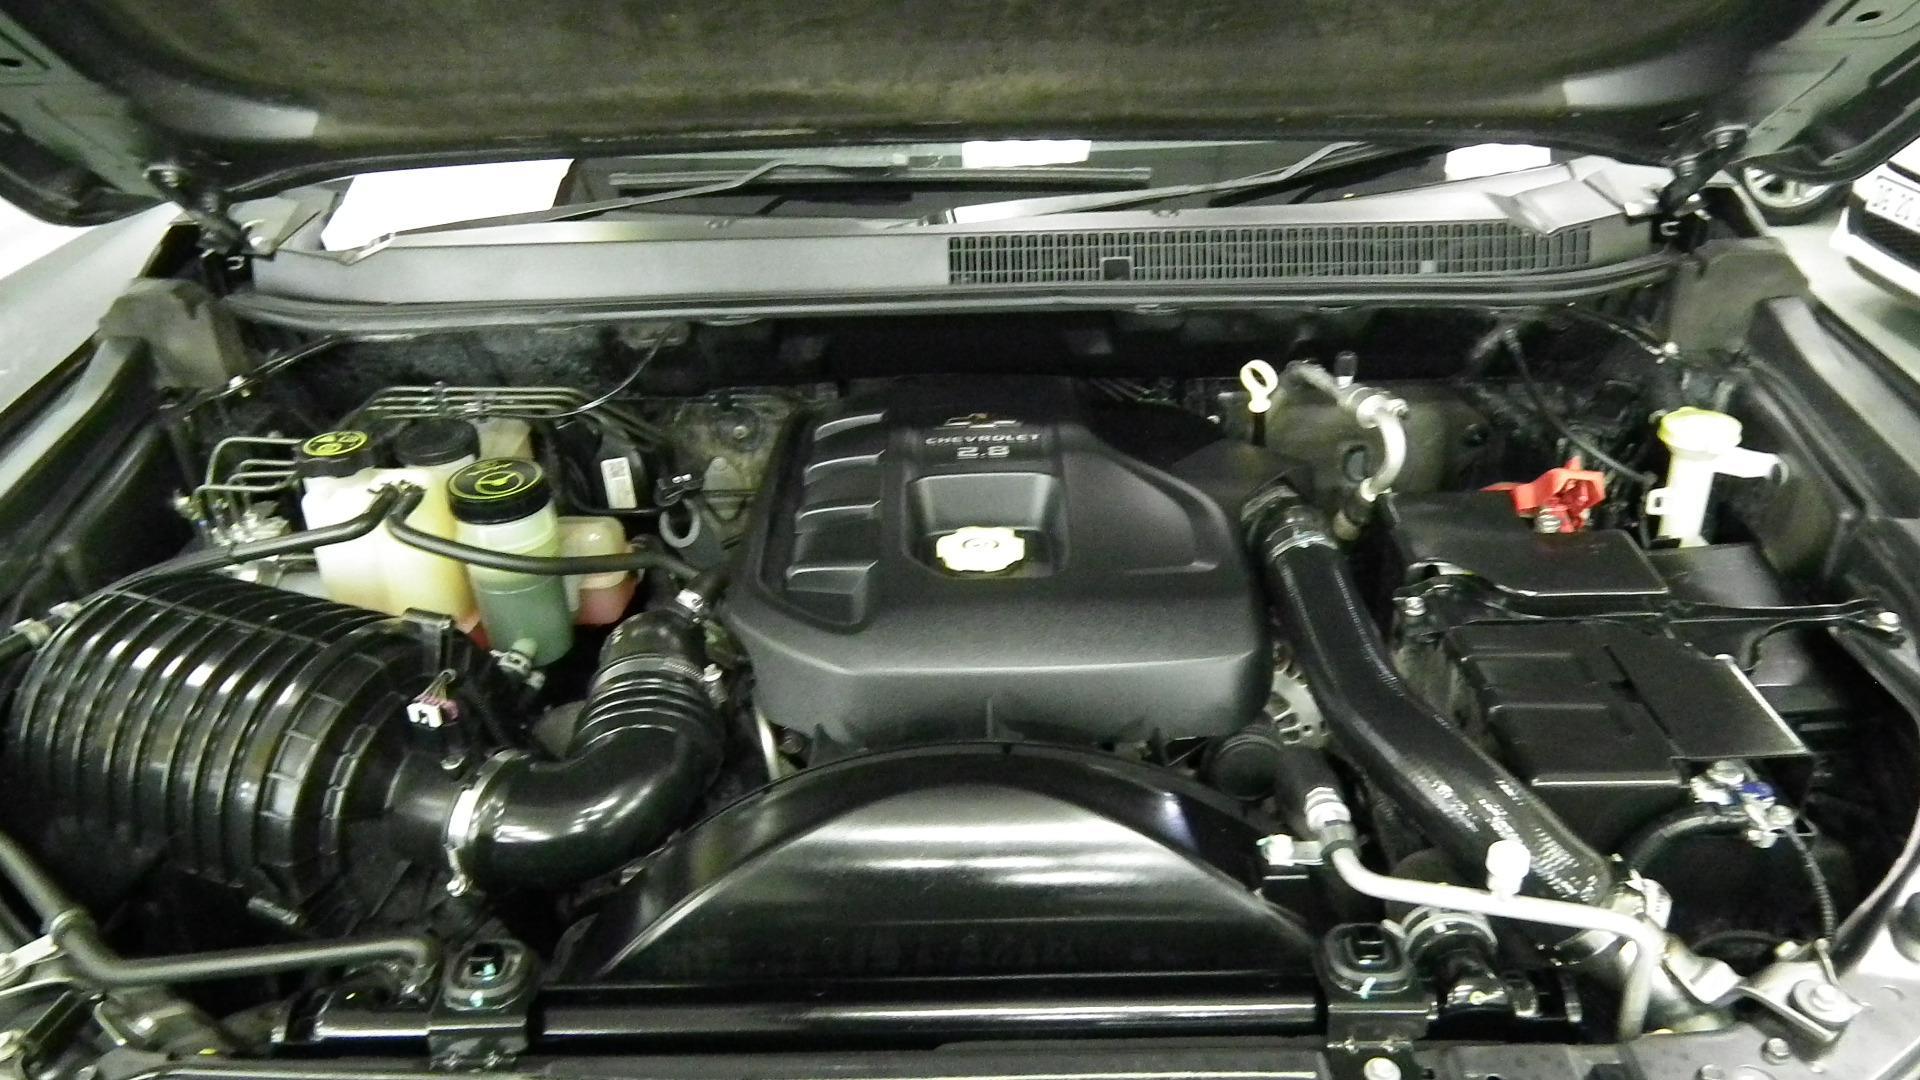 99 2017 Jrj293nw Chevrolet Trailblazer 2 8 Ltz 4x2 At Vin Mmm156lh0dh659823 Odo 121258 Colour Charcoal Electrical Gearbox Problems Battery